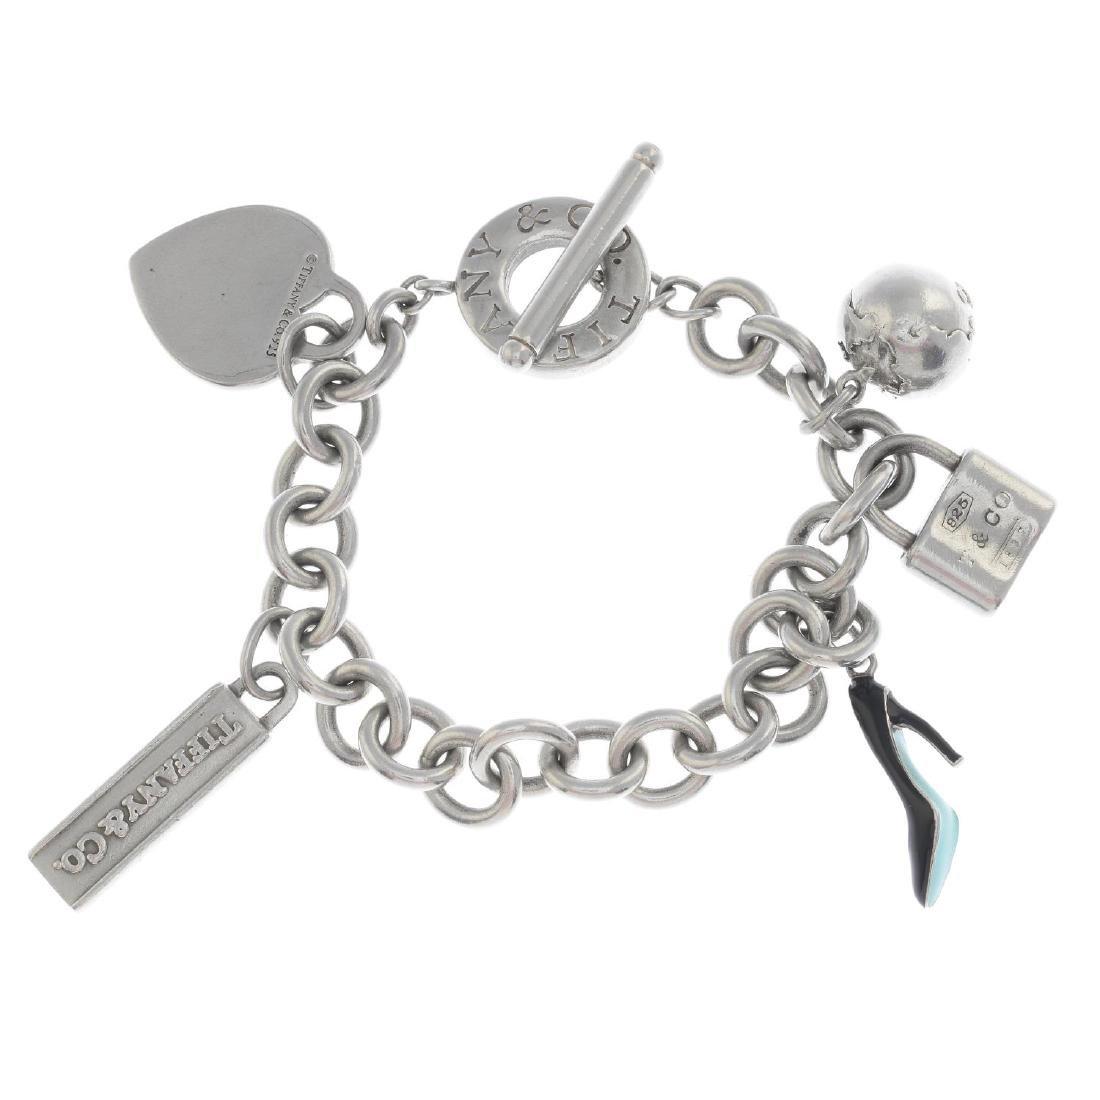 TIFFANY & CO. - a charm bracelet. The belcher-link